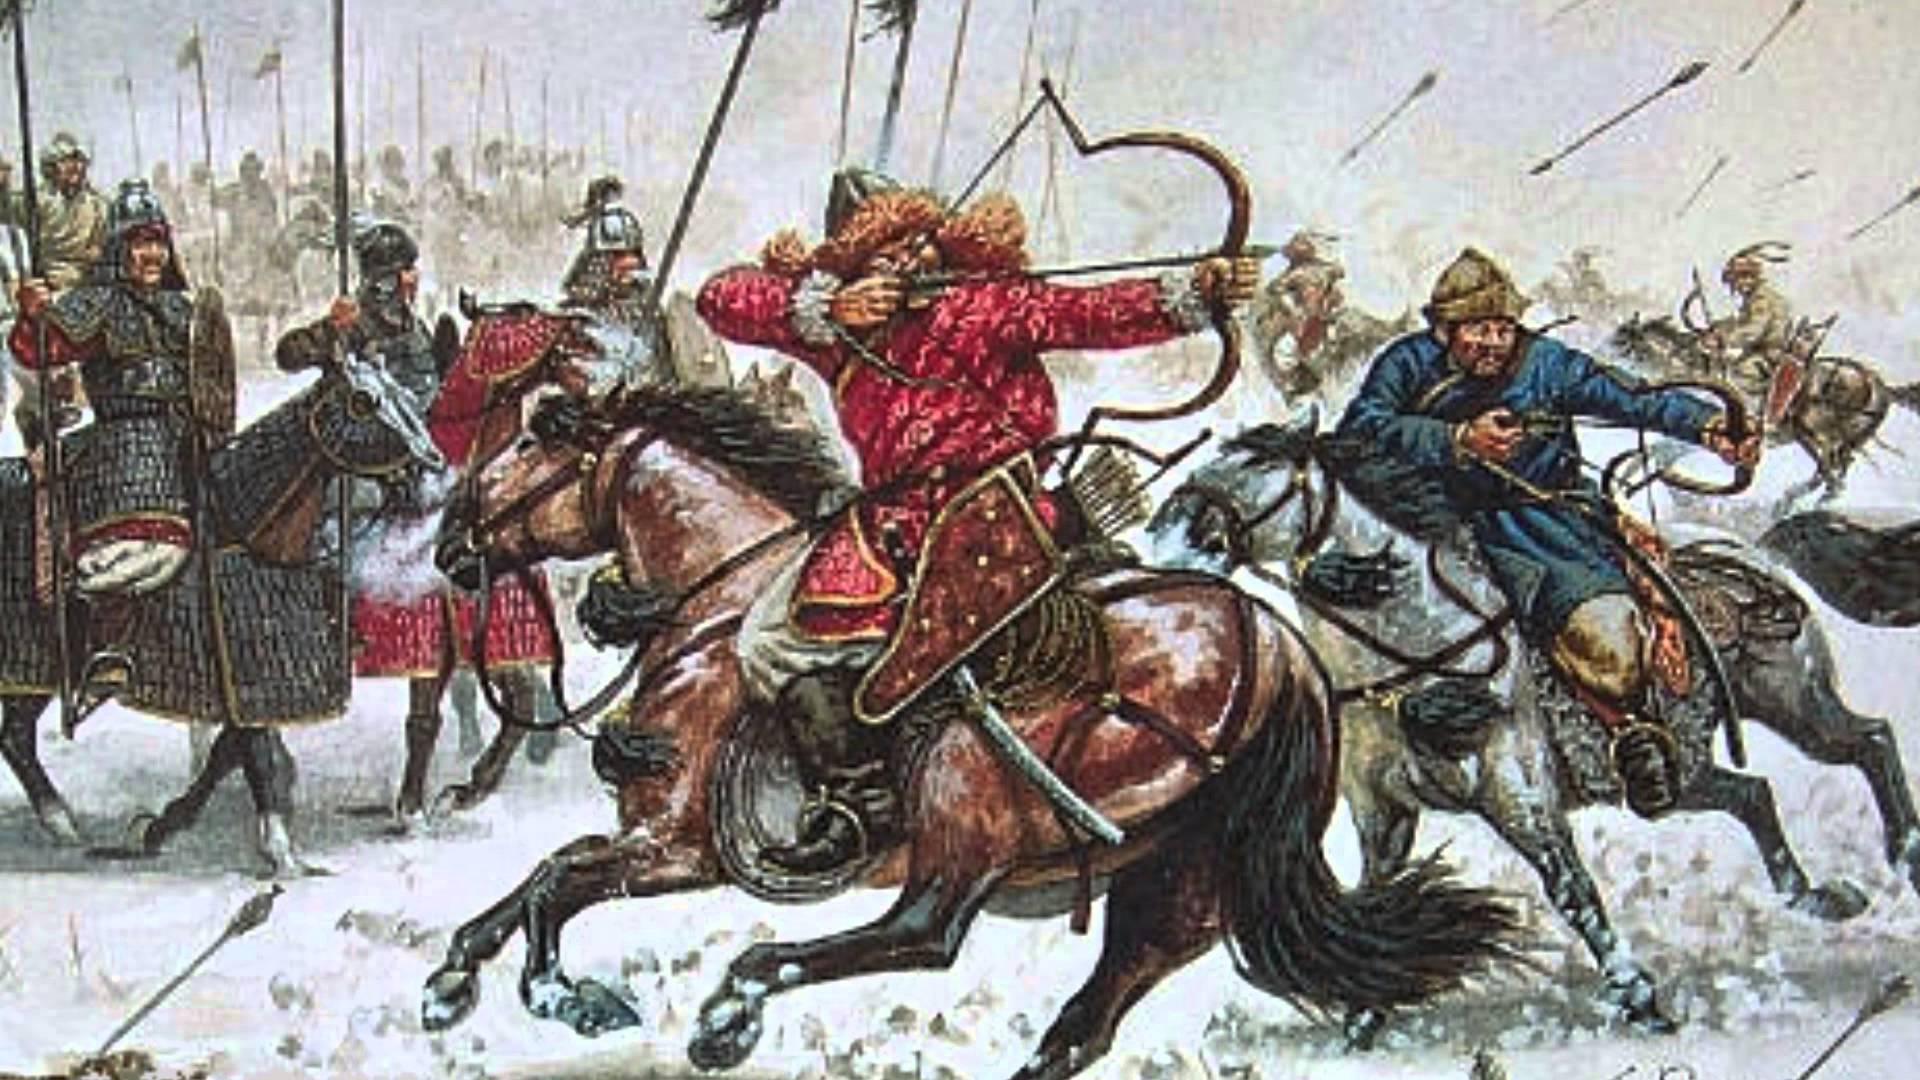 040318-73-Mongol-Empire-History